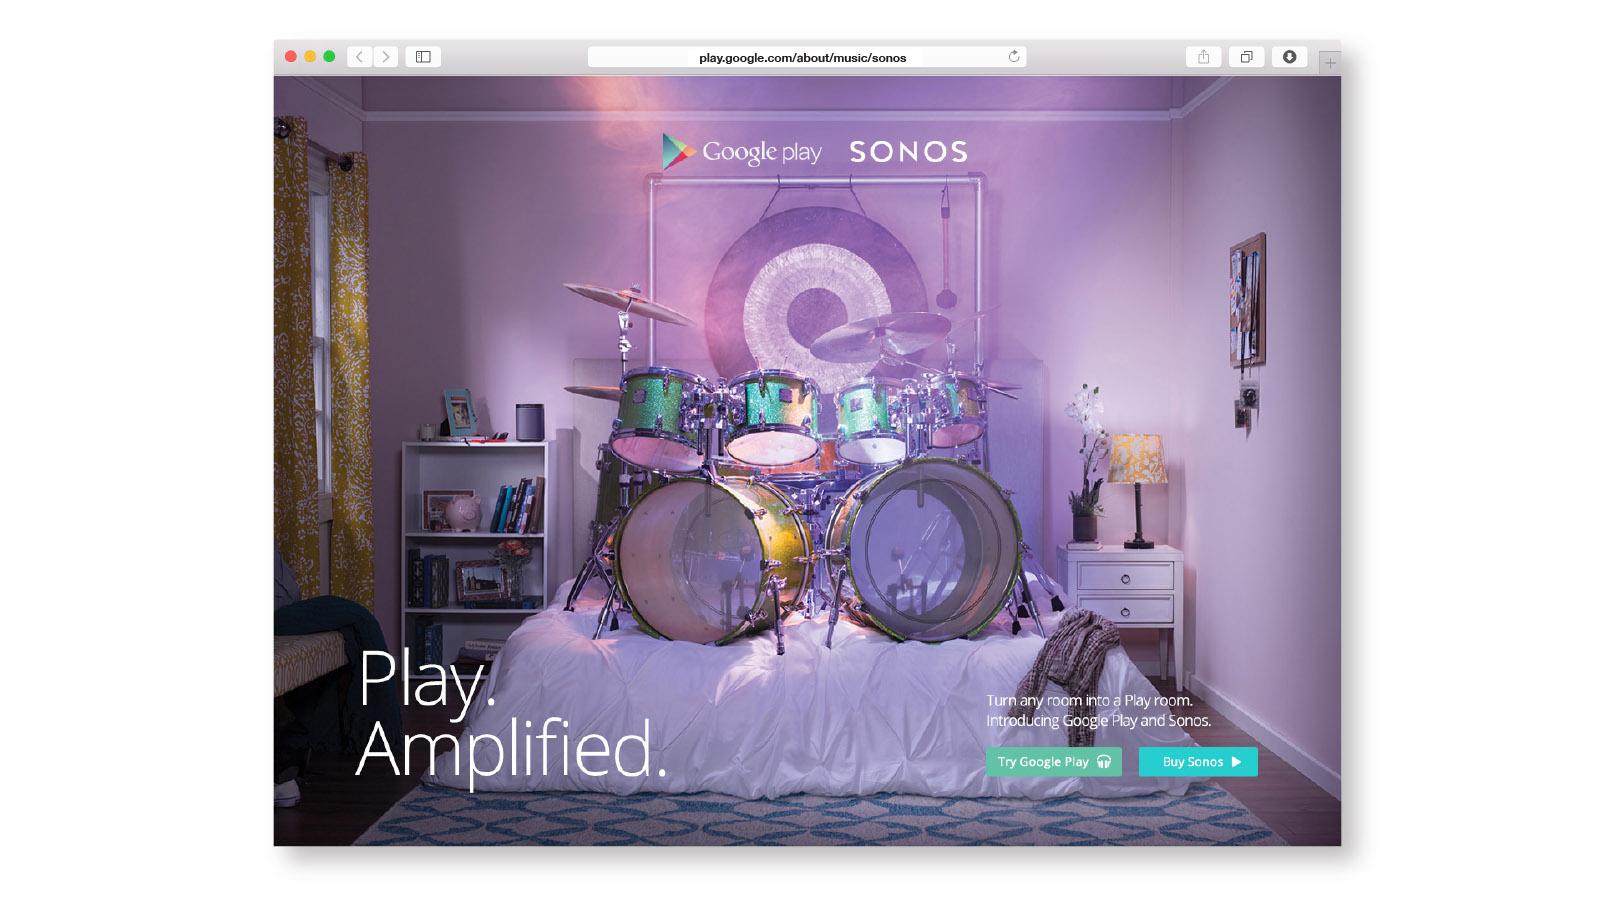 Google Play and Sonos – Gaston Yagmourian